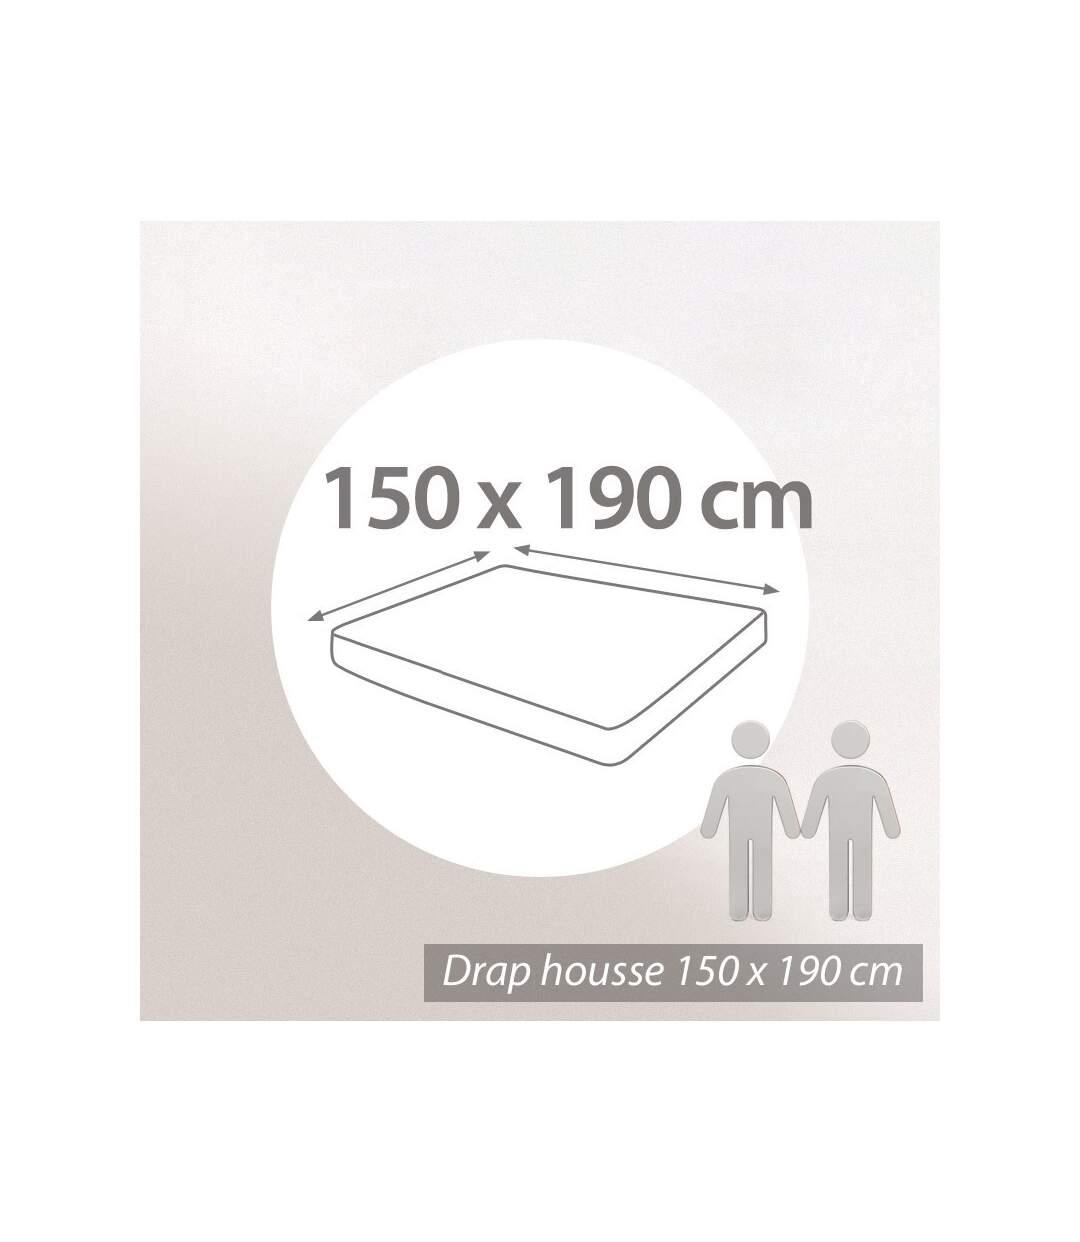 Protège matelas imperméable Antony blanc 150x190 Grand Bonnet 40cm